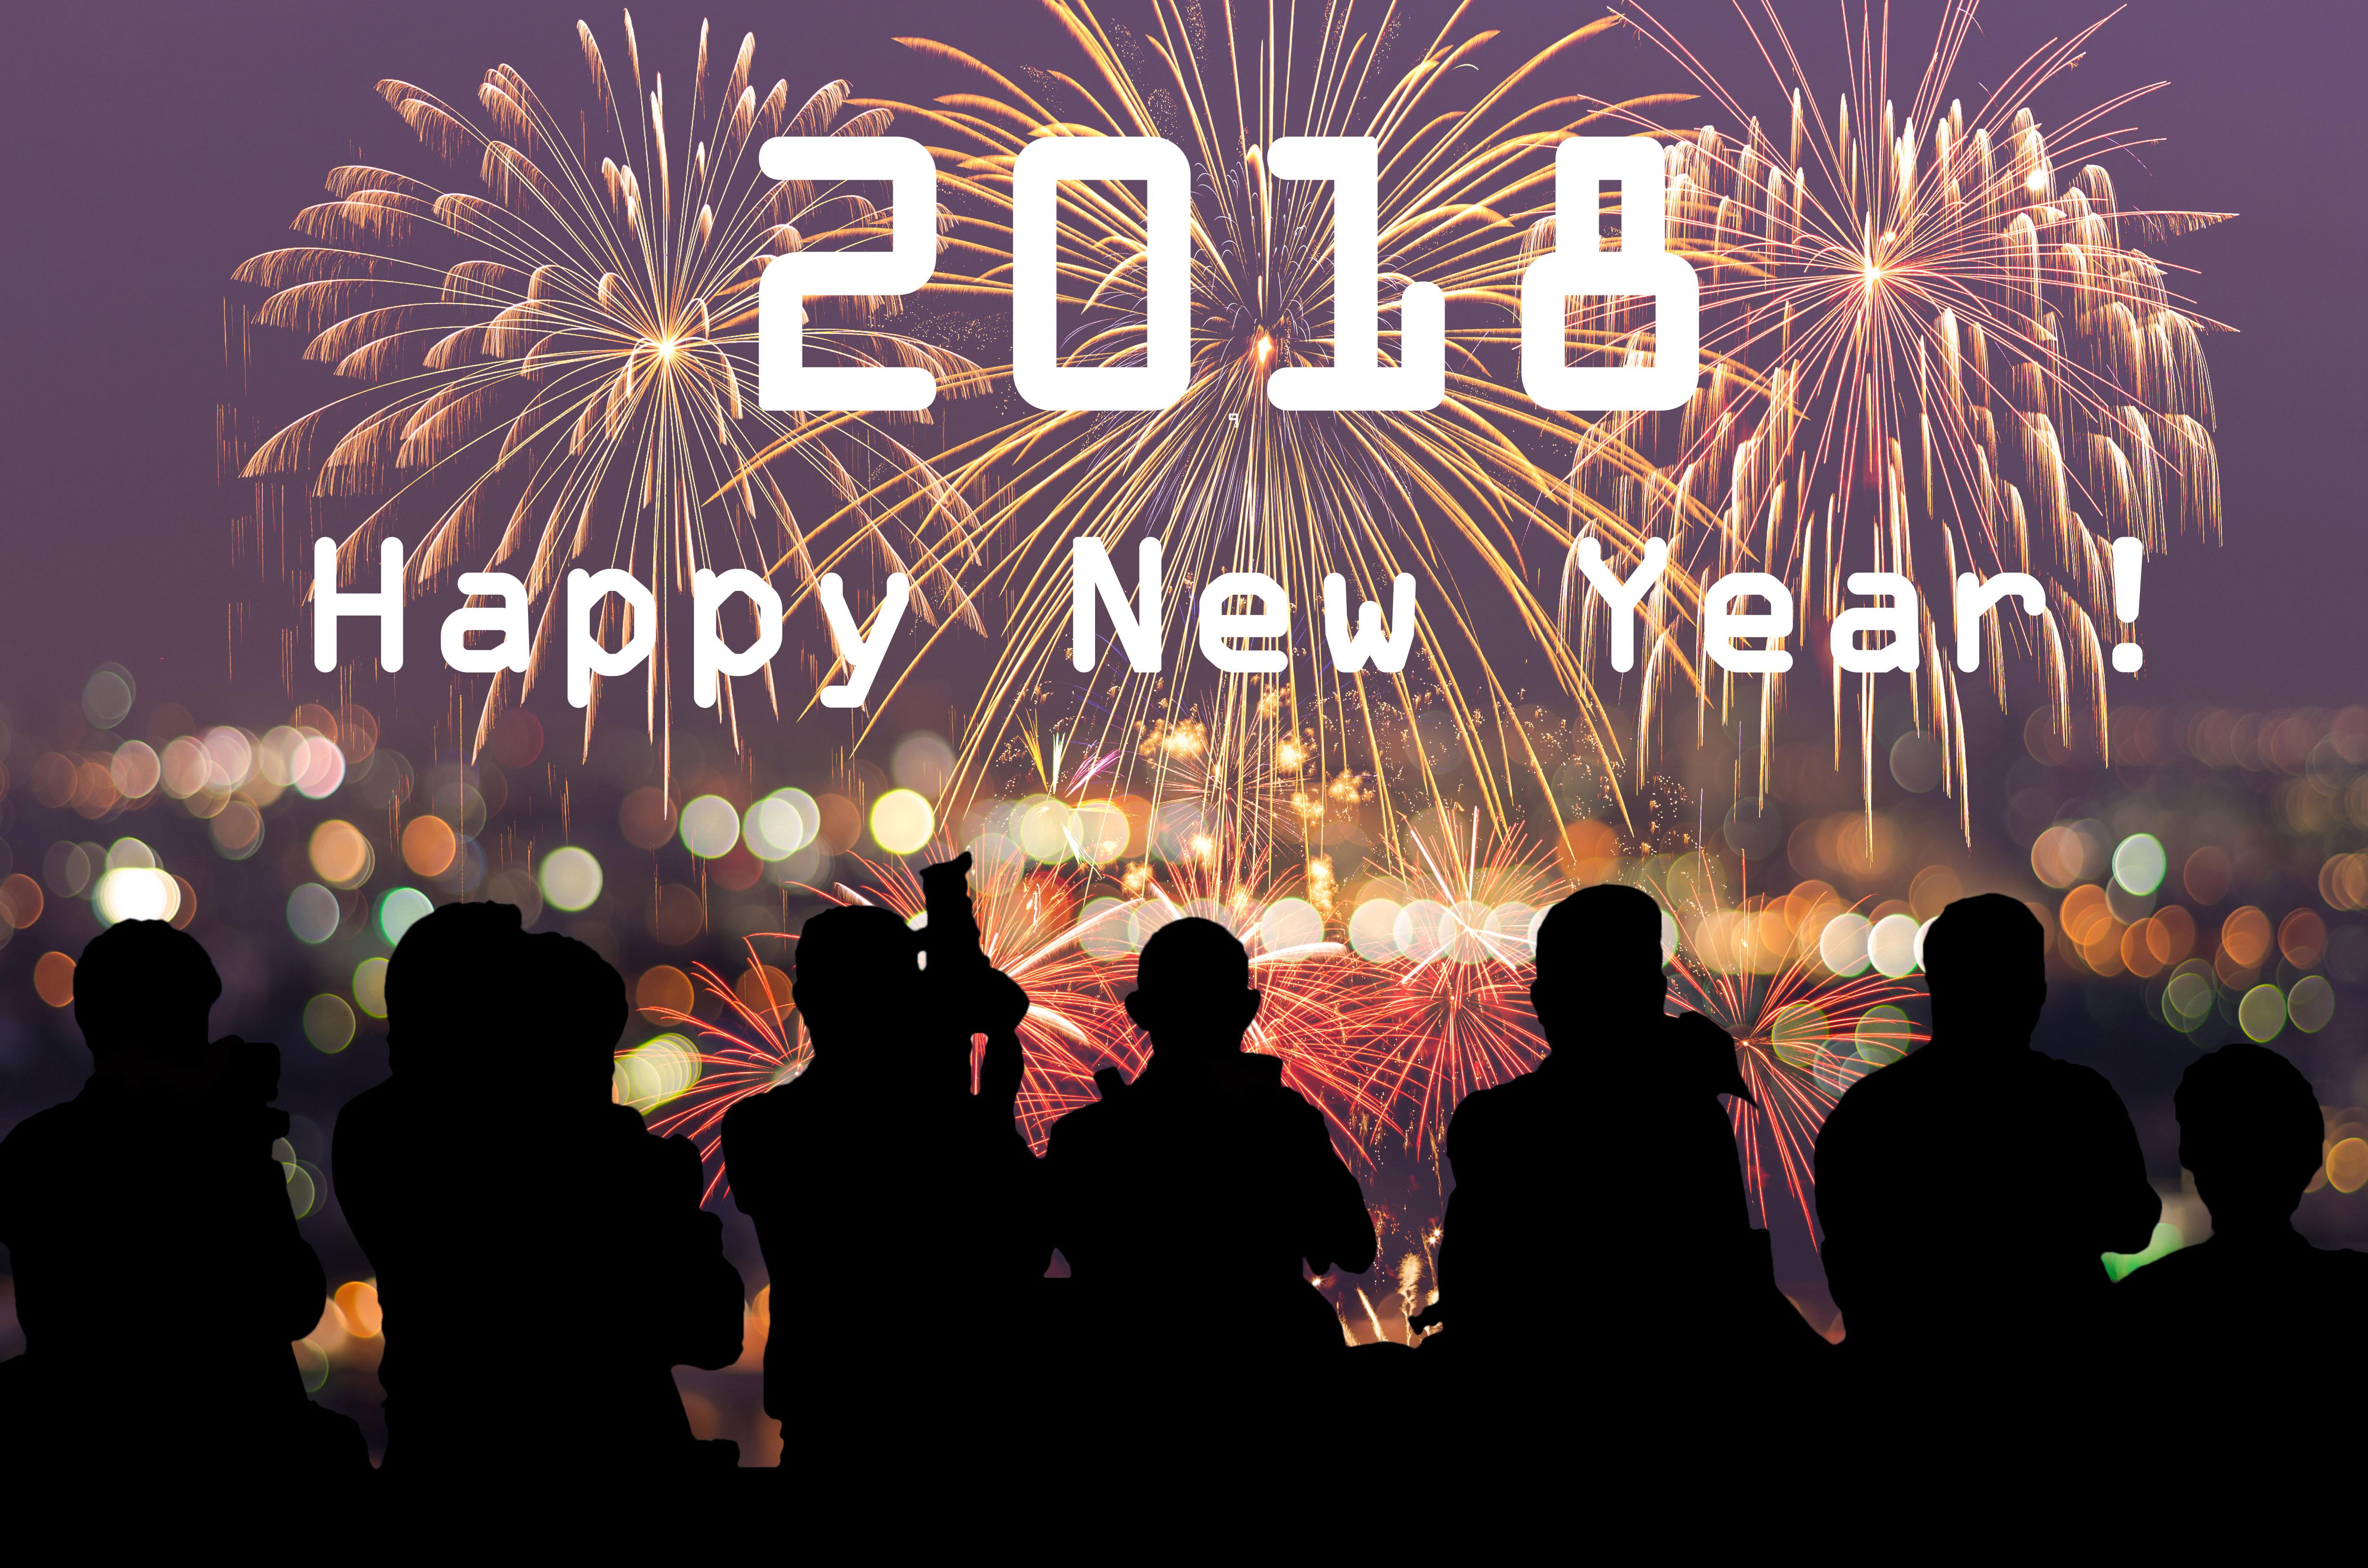 shutterstock_happynewyear 2018